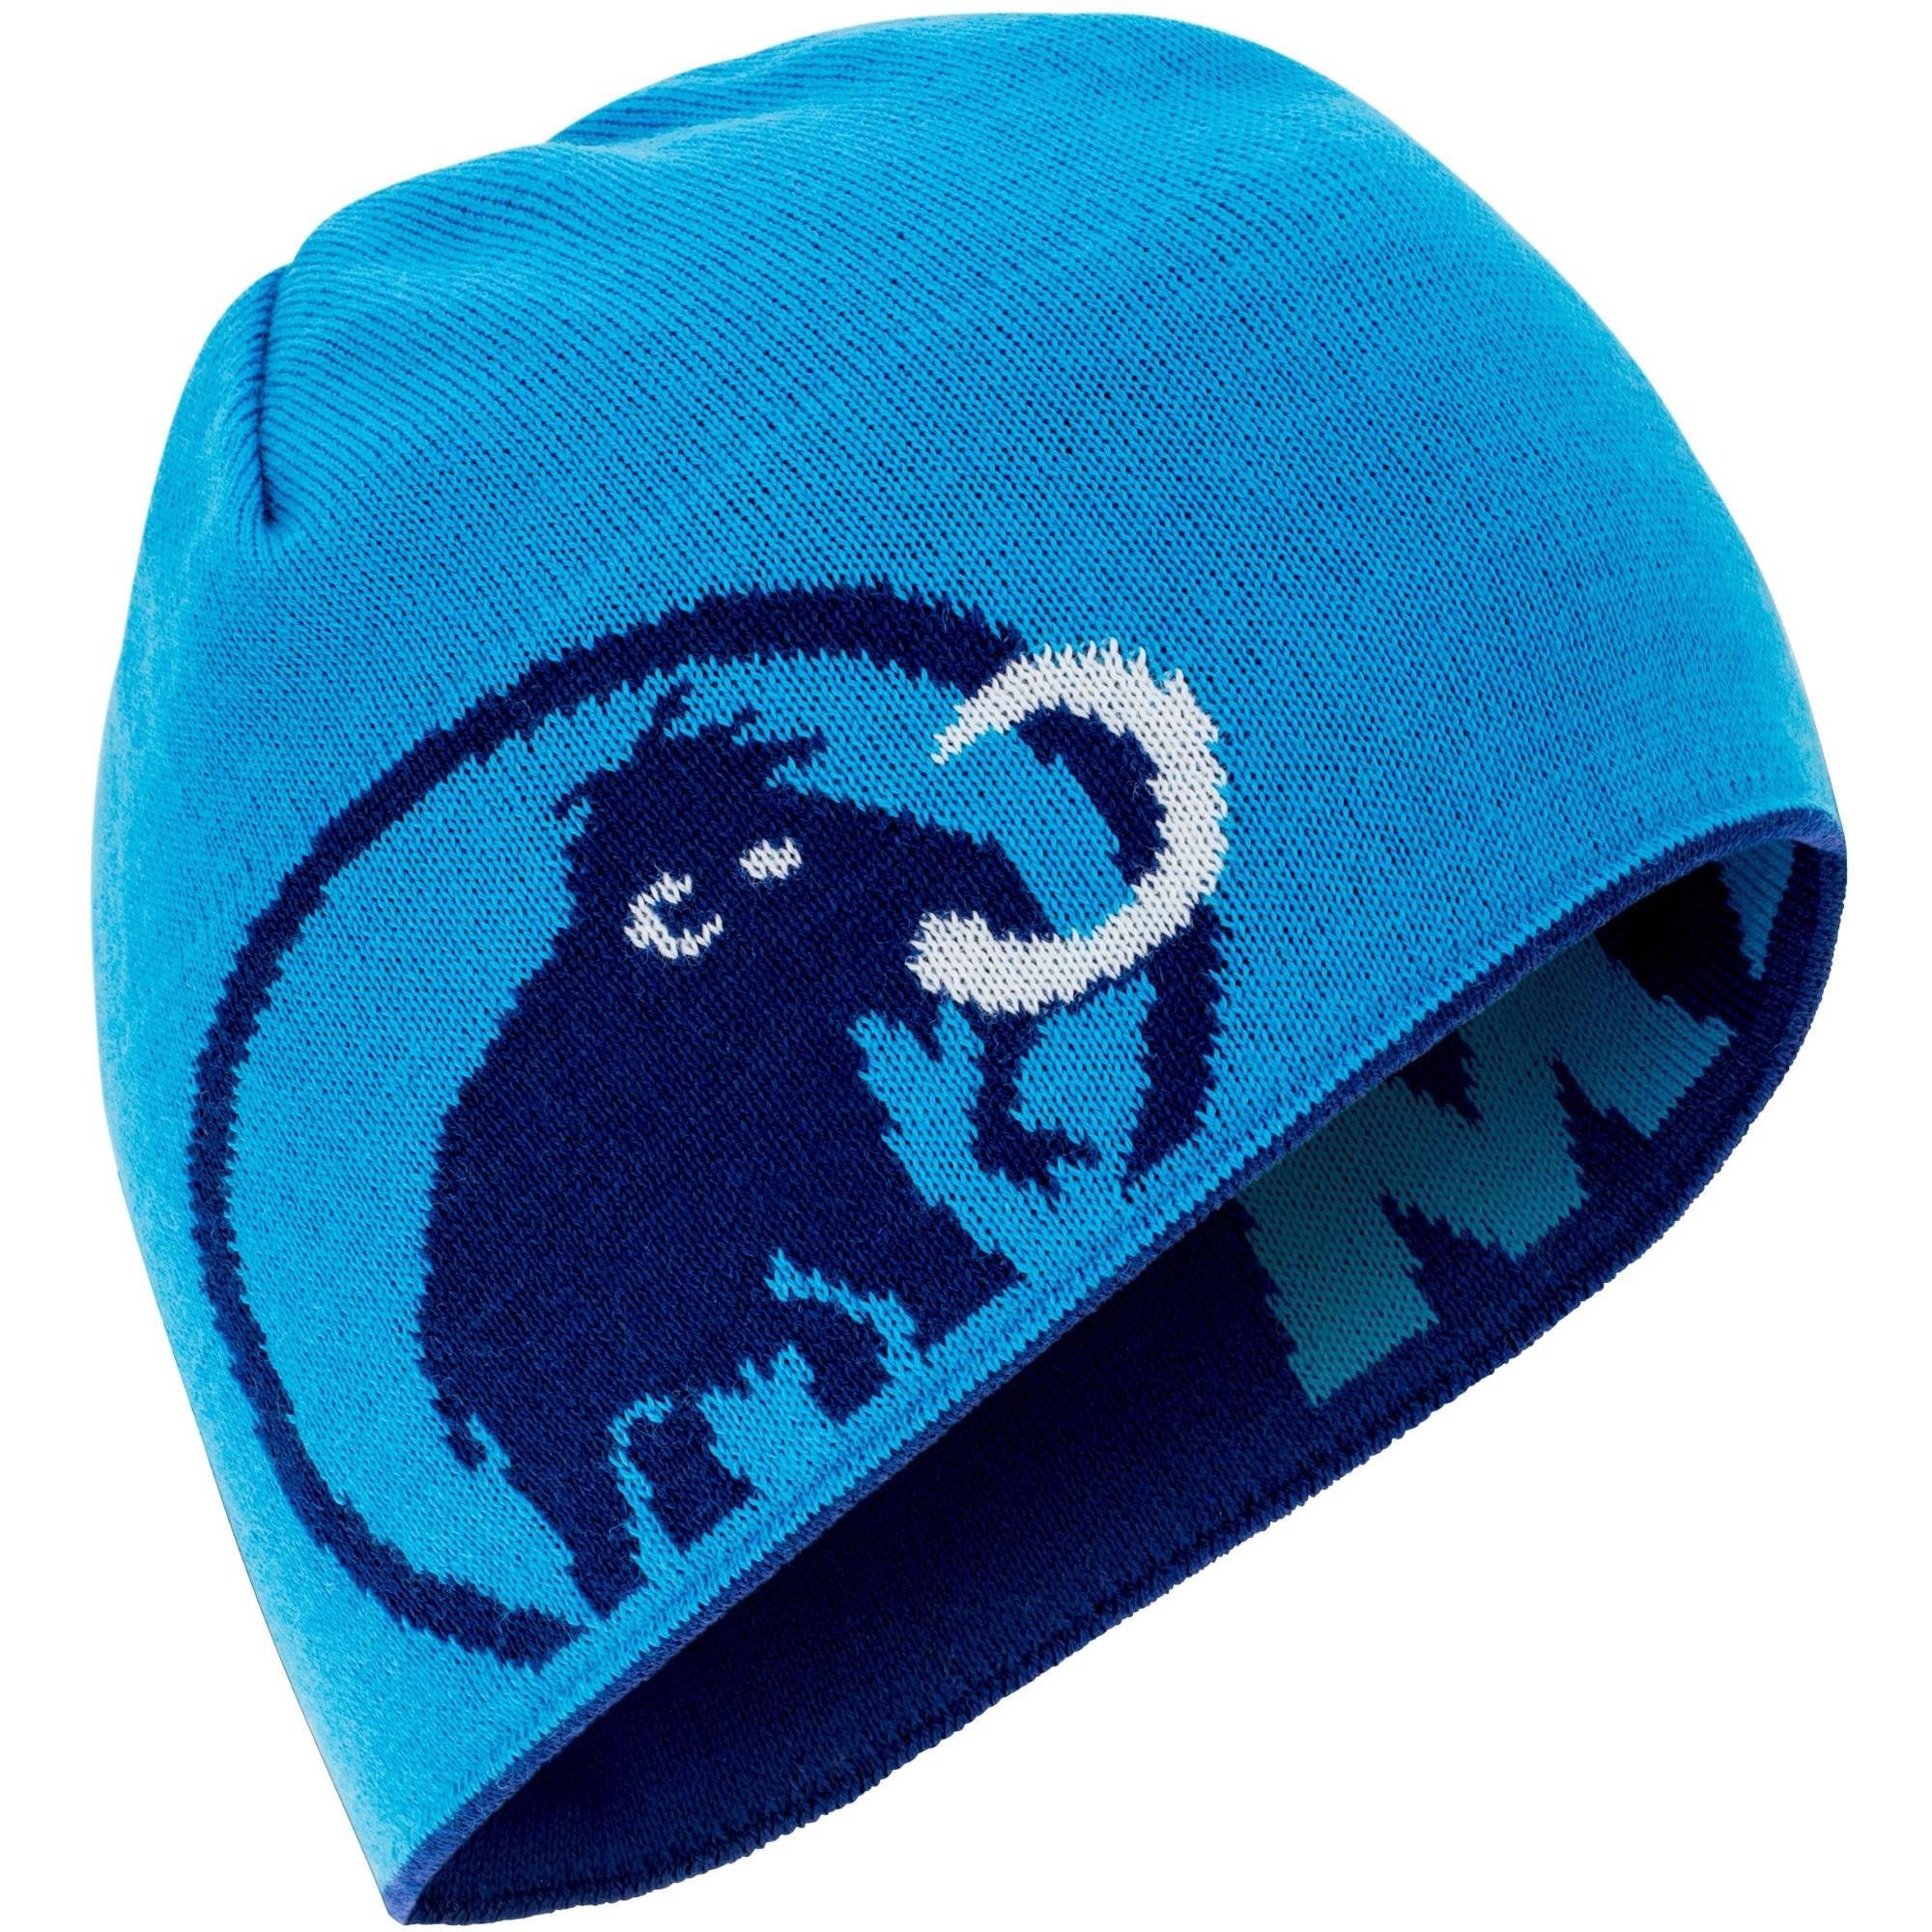 Mammut Logo Beanie - Ultramarine/Imperial